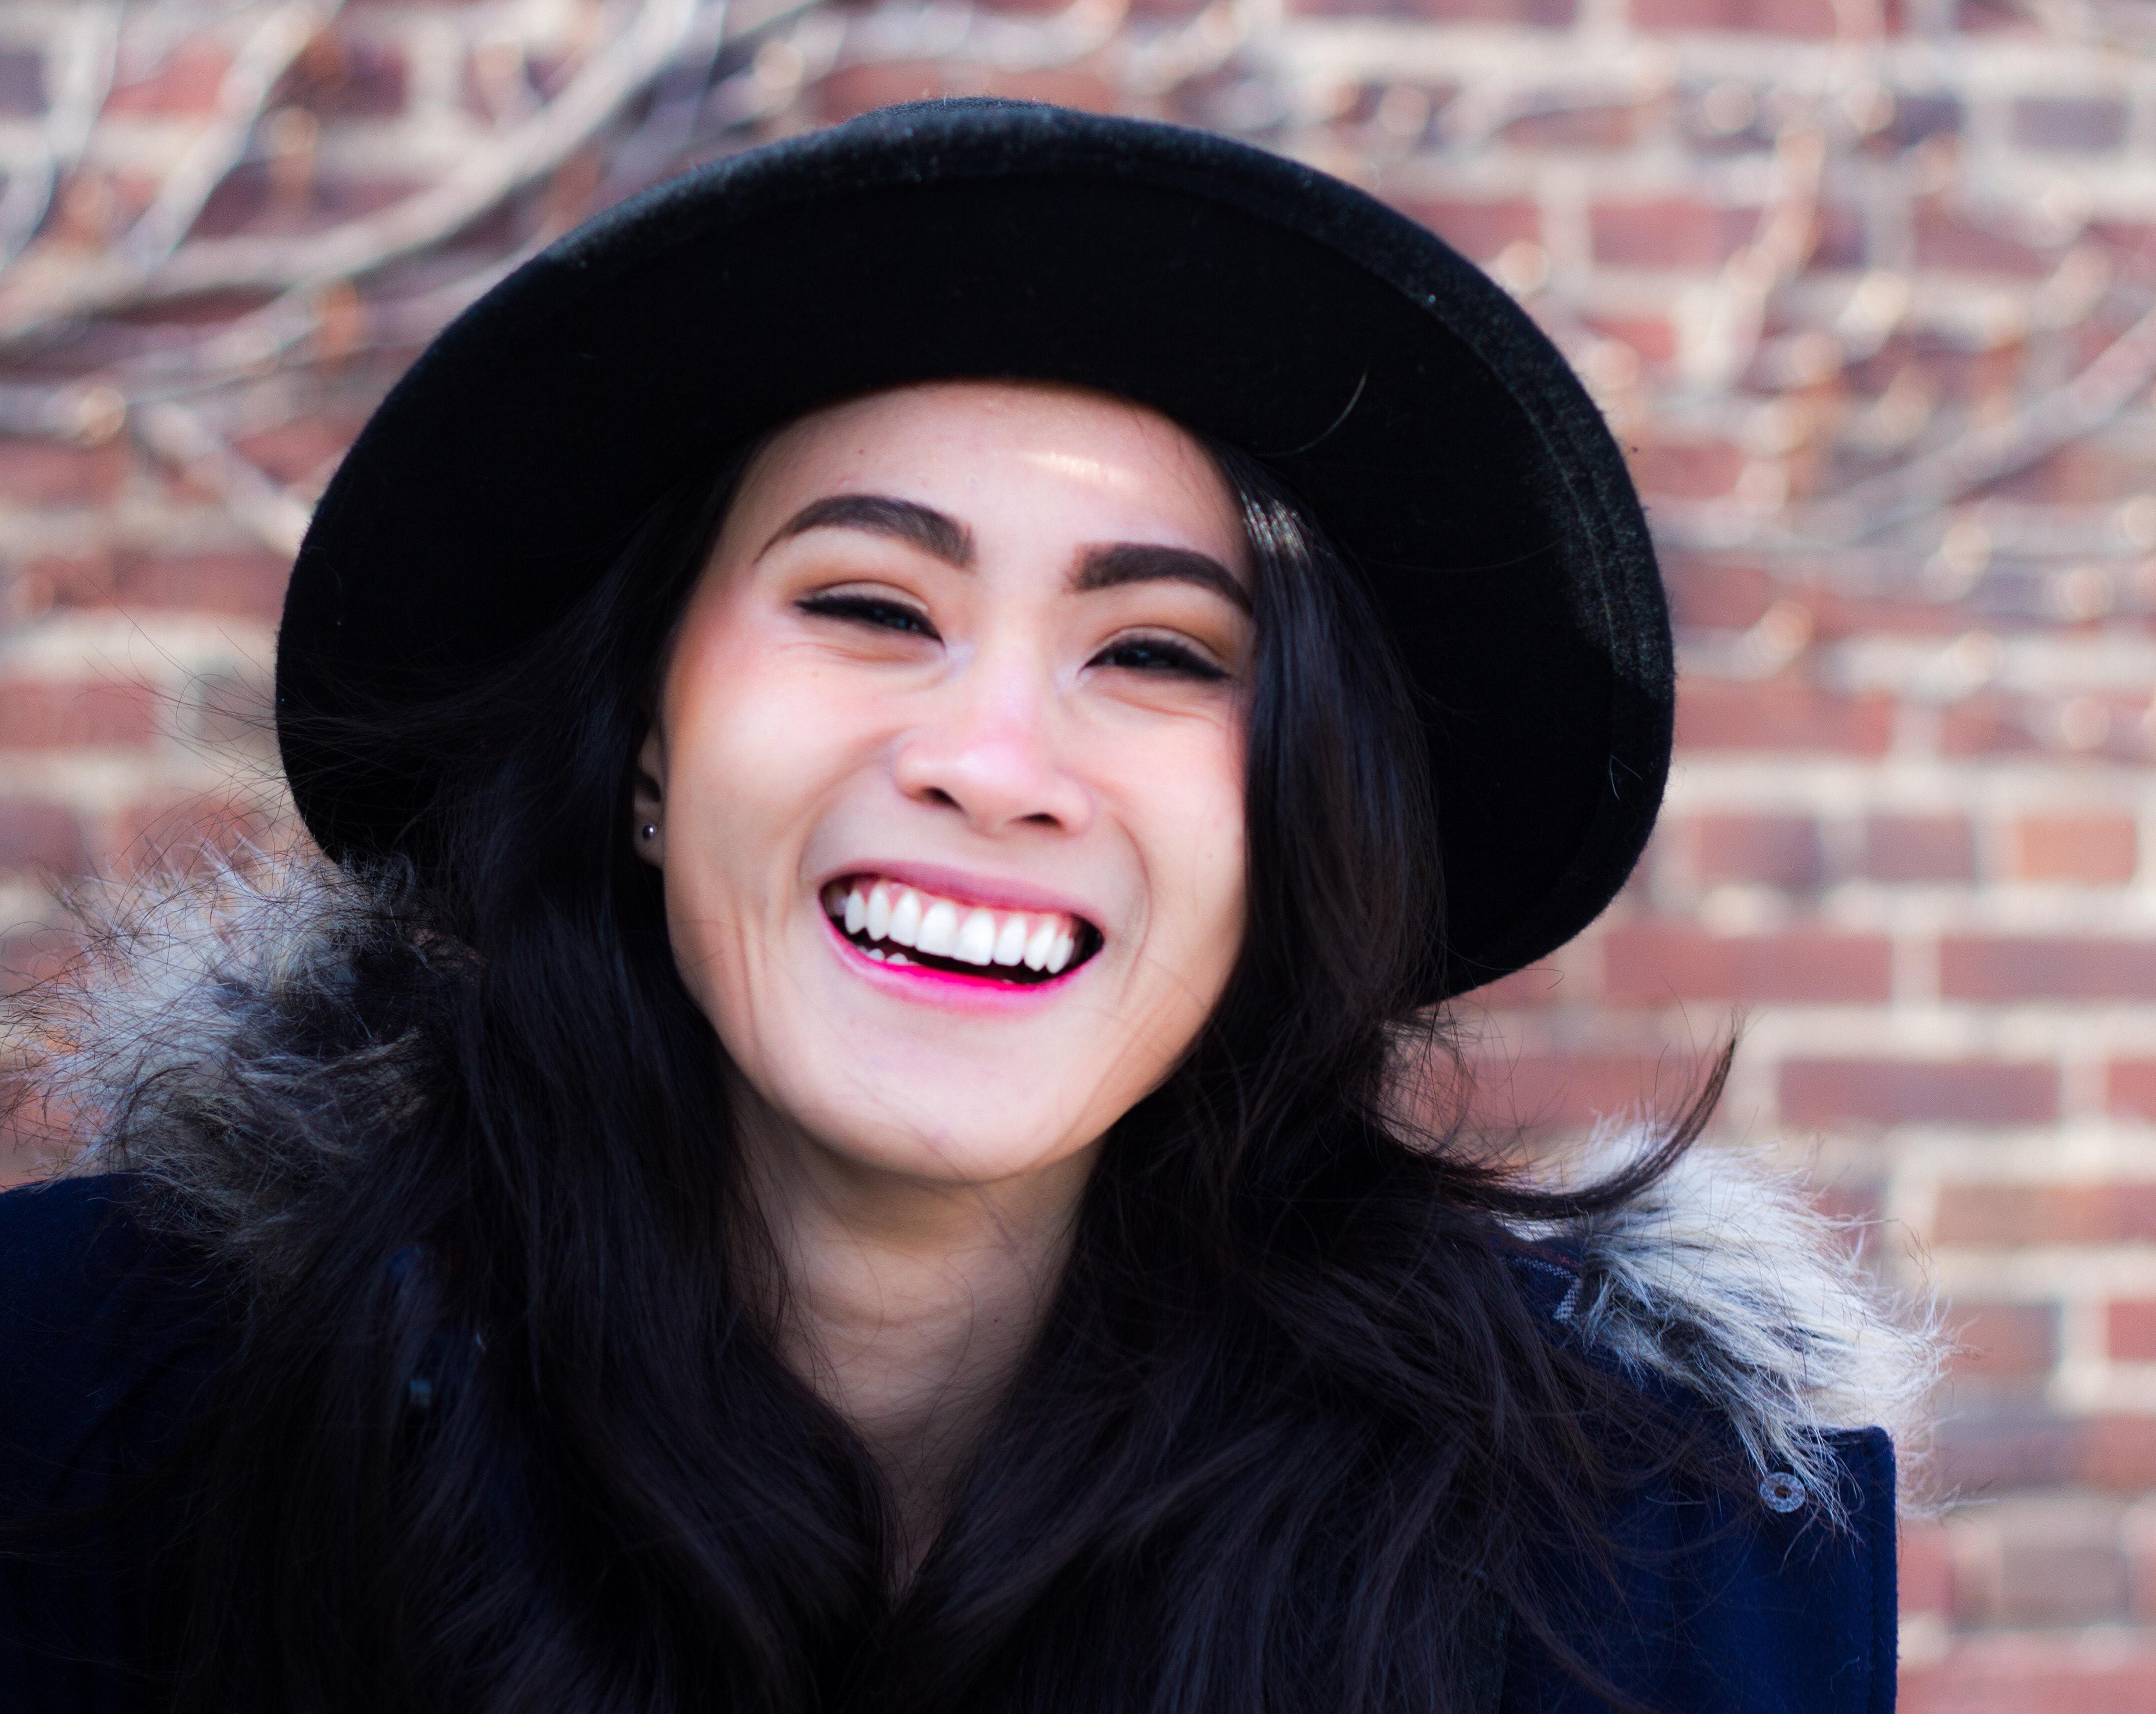 Woman wearing black fedora hat photo